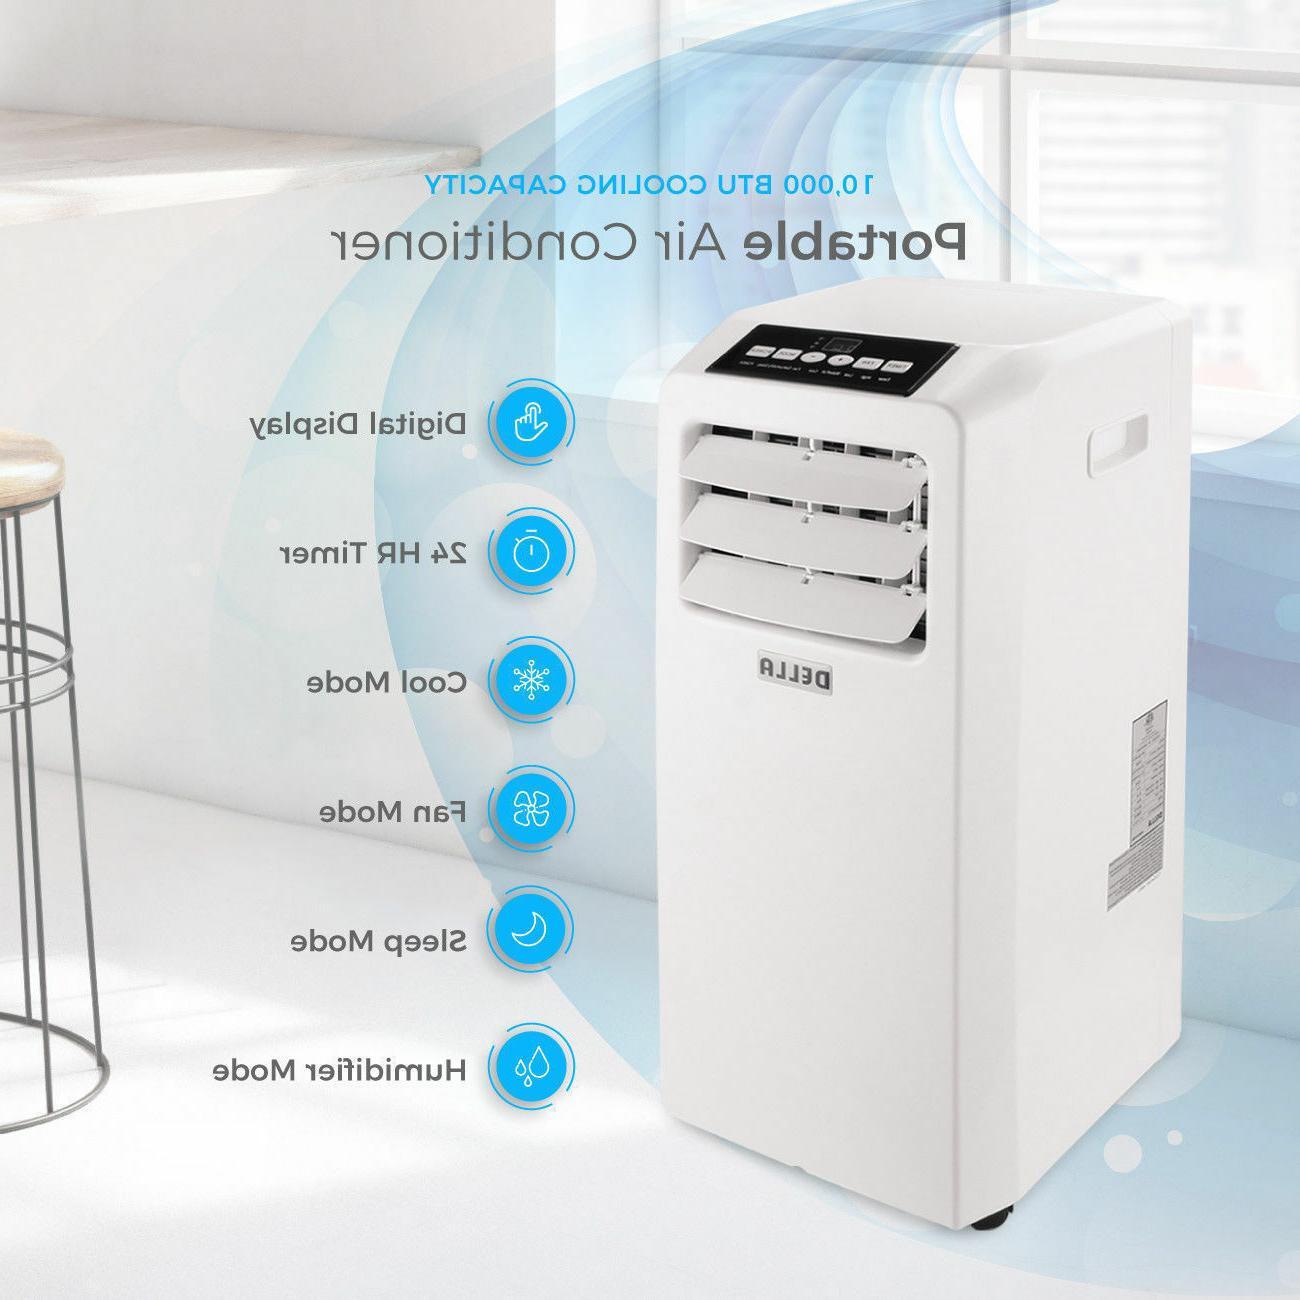 DELLA Air Cooling Fan 10000 BTU Dehumidifier Included Window White